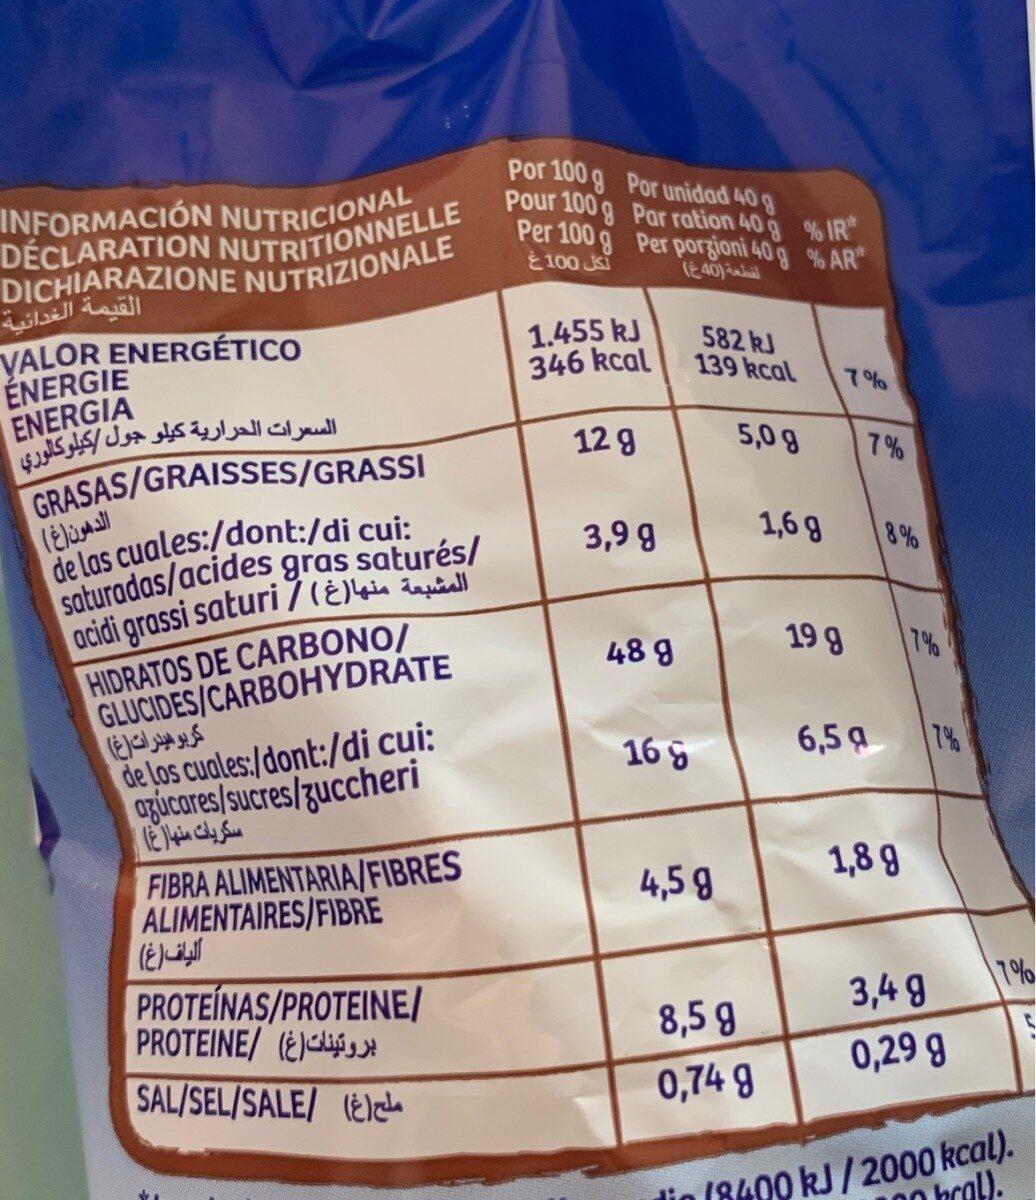 La Bella Easo Weikis Chocolate Con Leche 6 Uds. - Informations nutritionnelles - fr